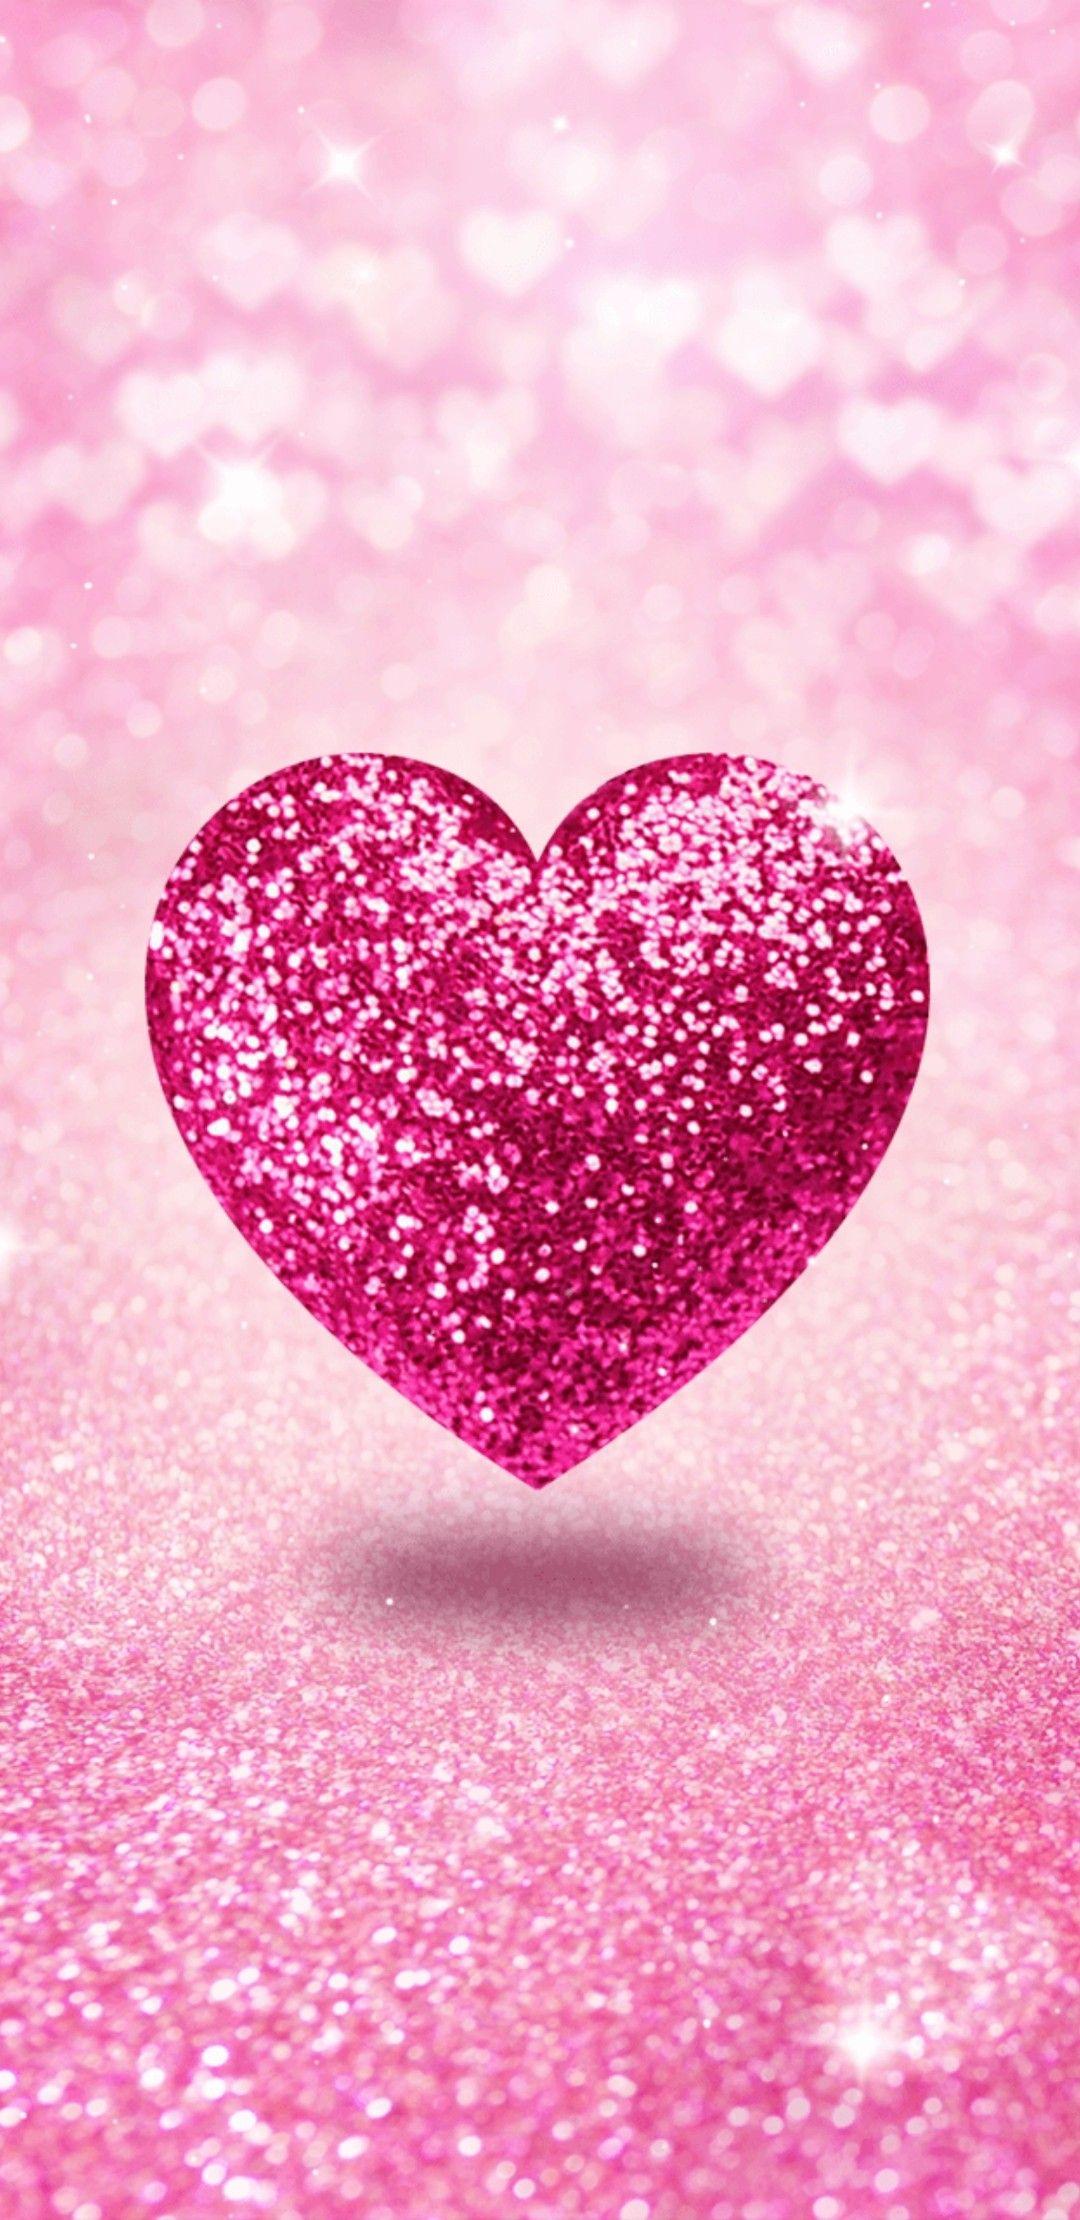 Pin By Jovana Lotina On Heart Wallpaper 5 Iphone Wallpaper Glitter Glitter Wallpaper Heart Wallpaper Glitter pink love wallpaper